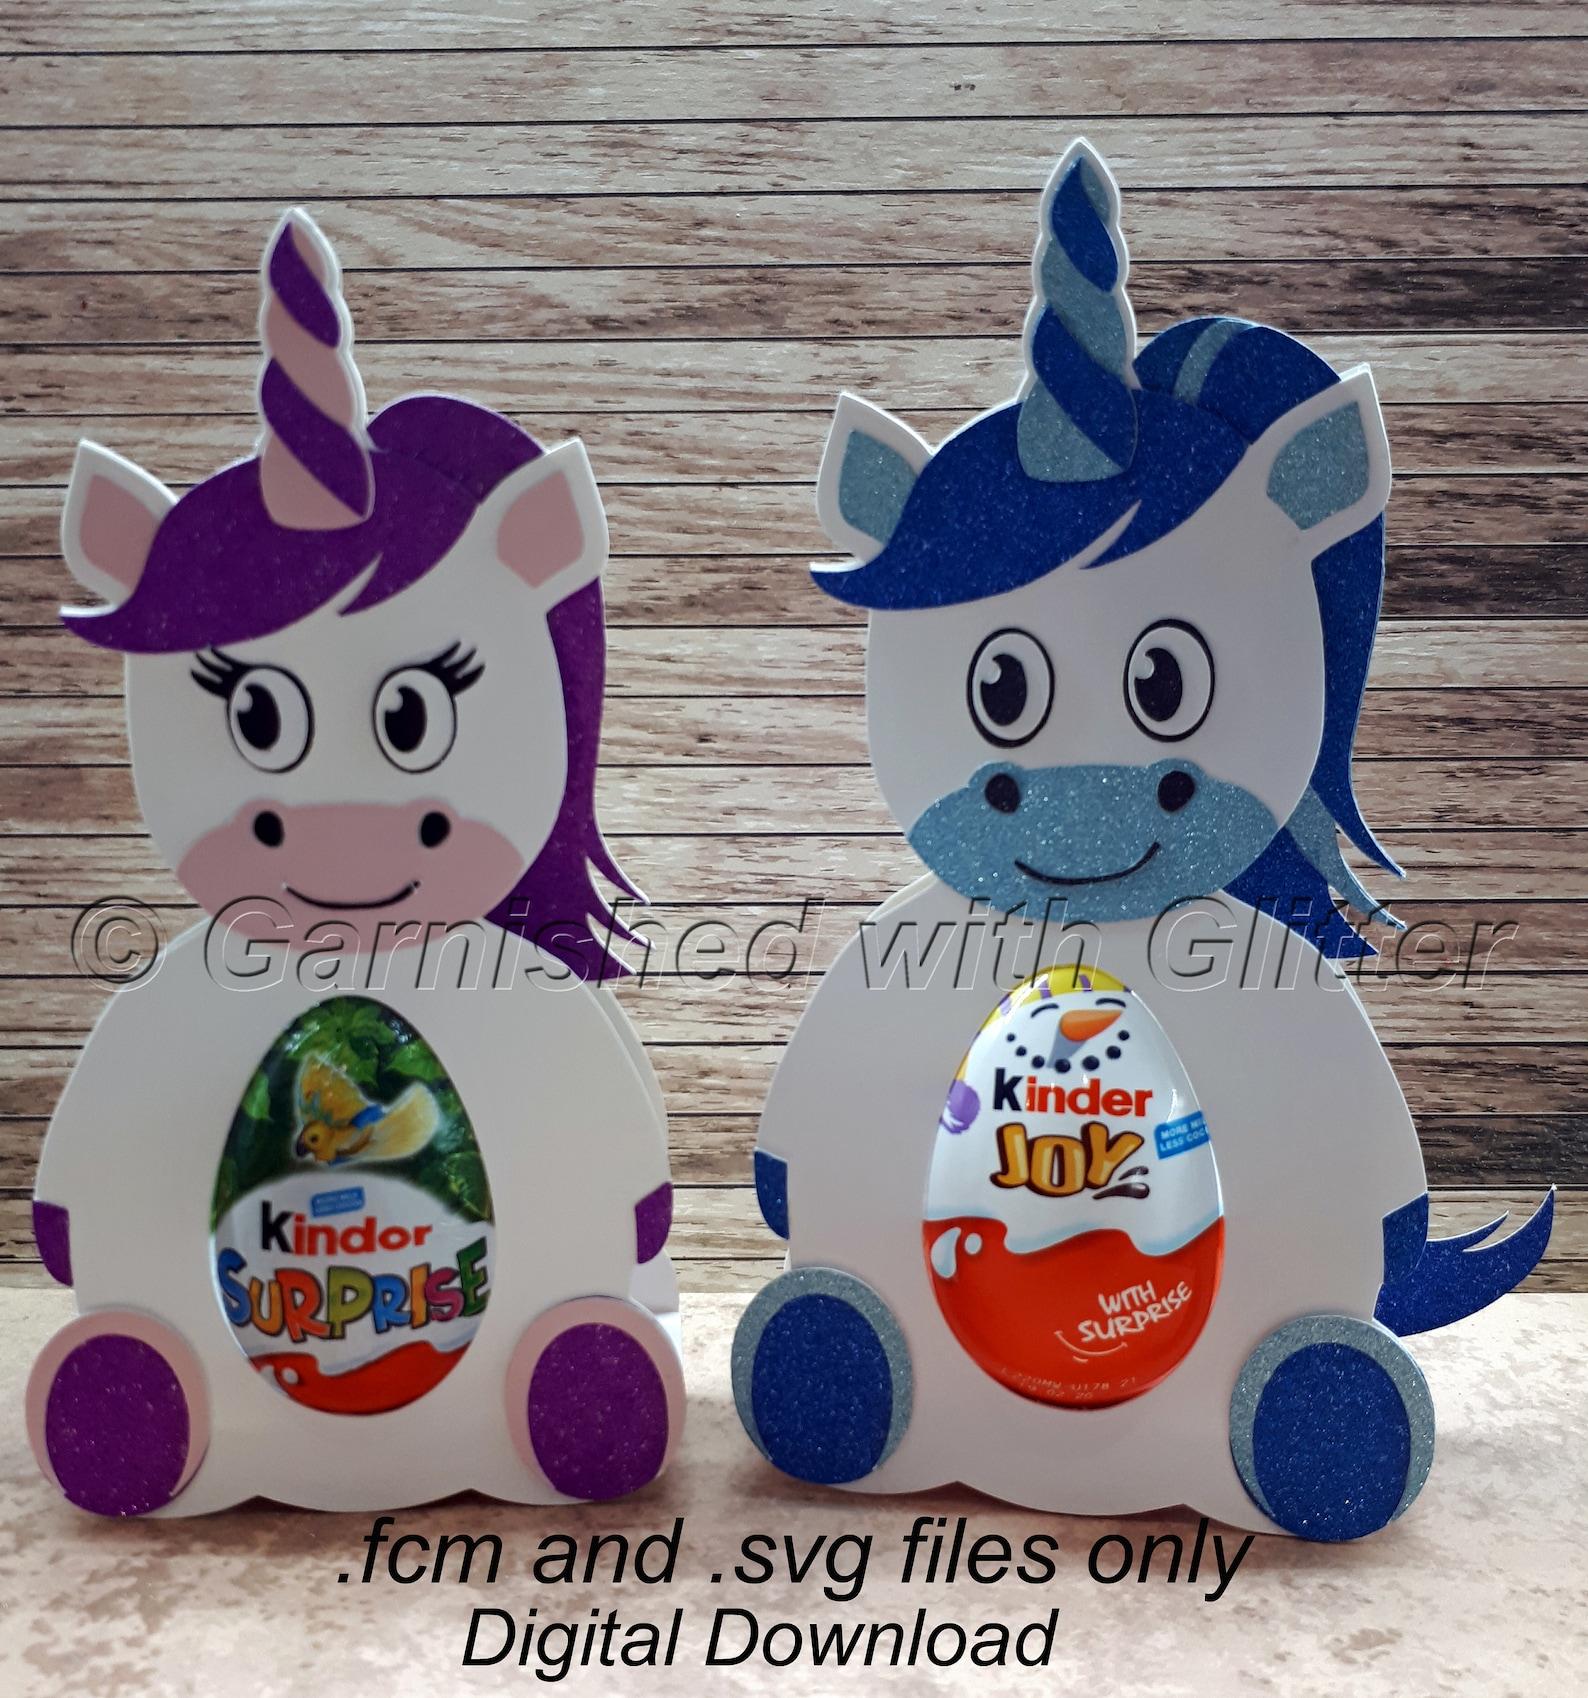 Unicorn Digital Download Cutting Files. fcm and svg. Suitable for Kinder JOY, Kinder Surprise and Creme Egg Sized confectionery